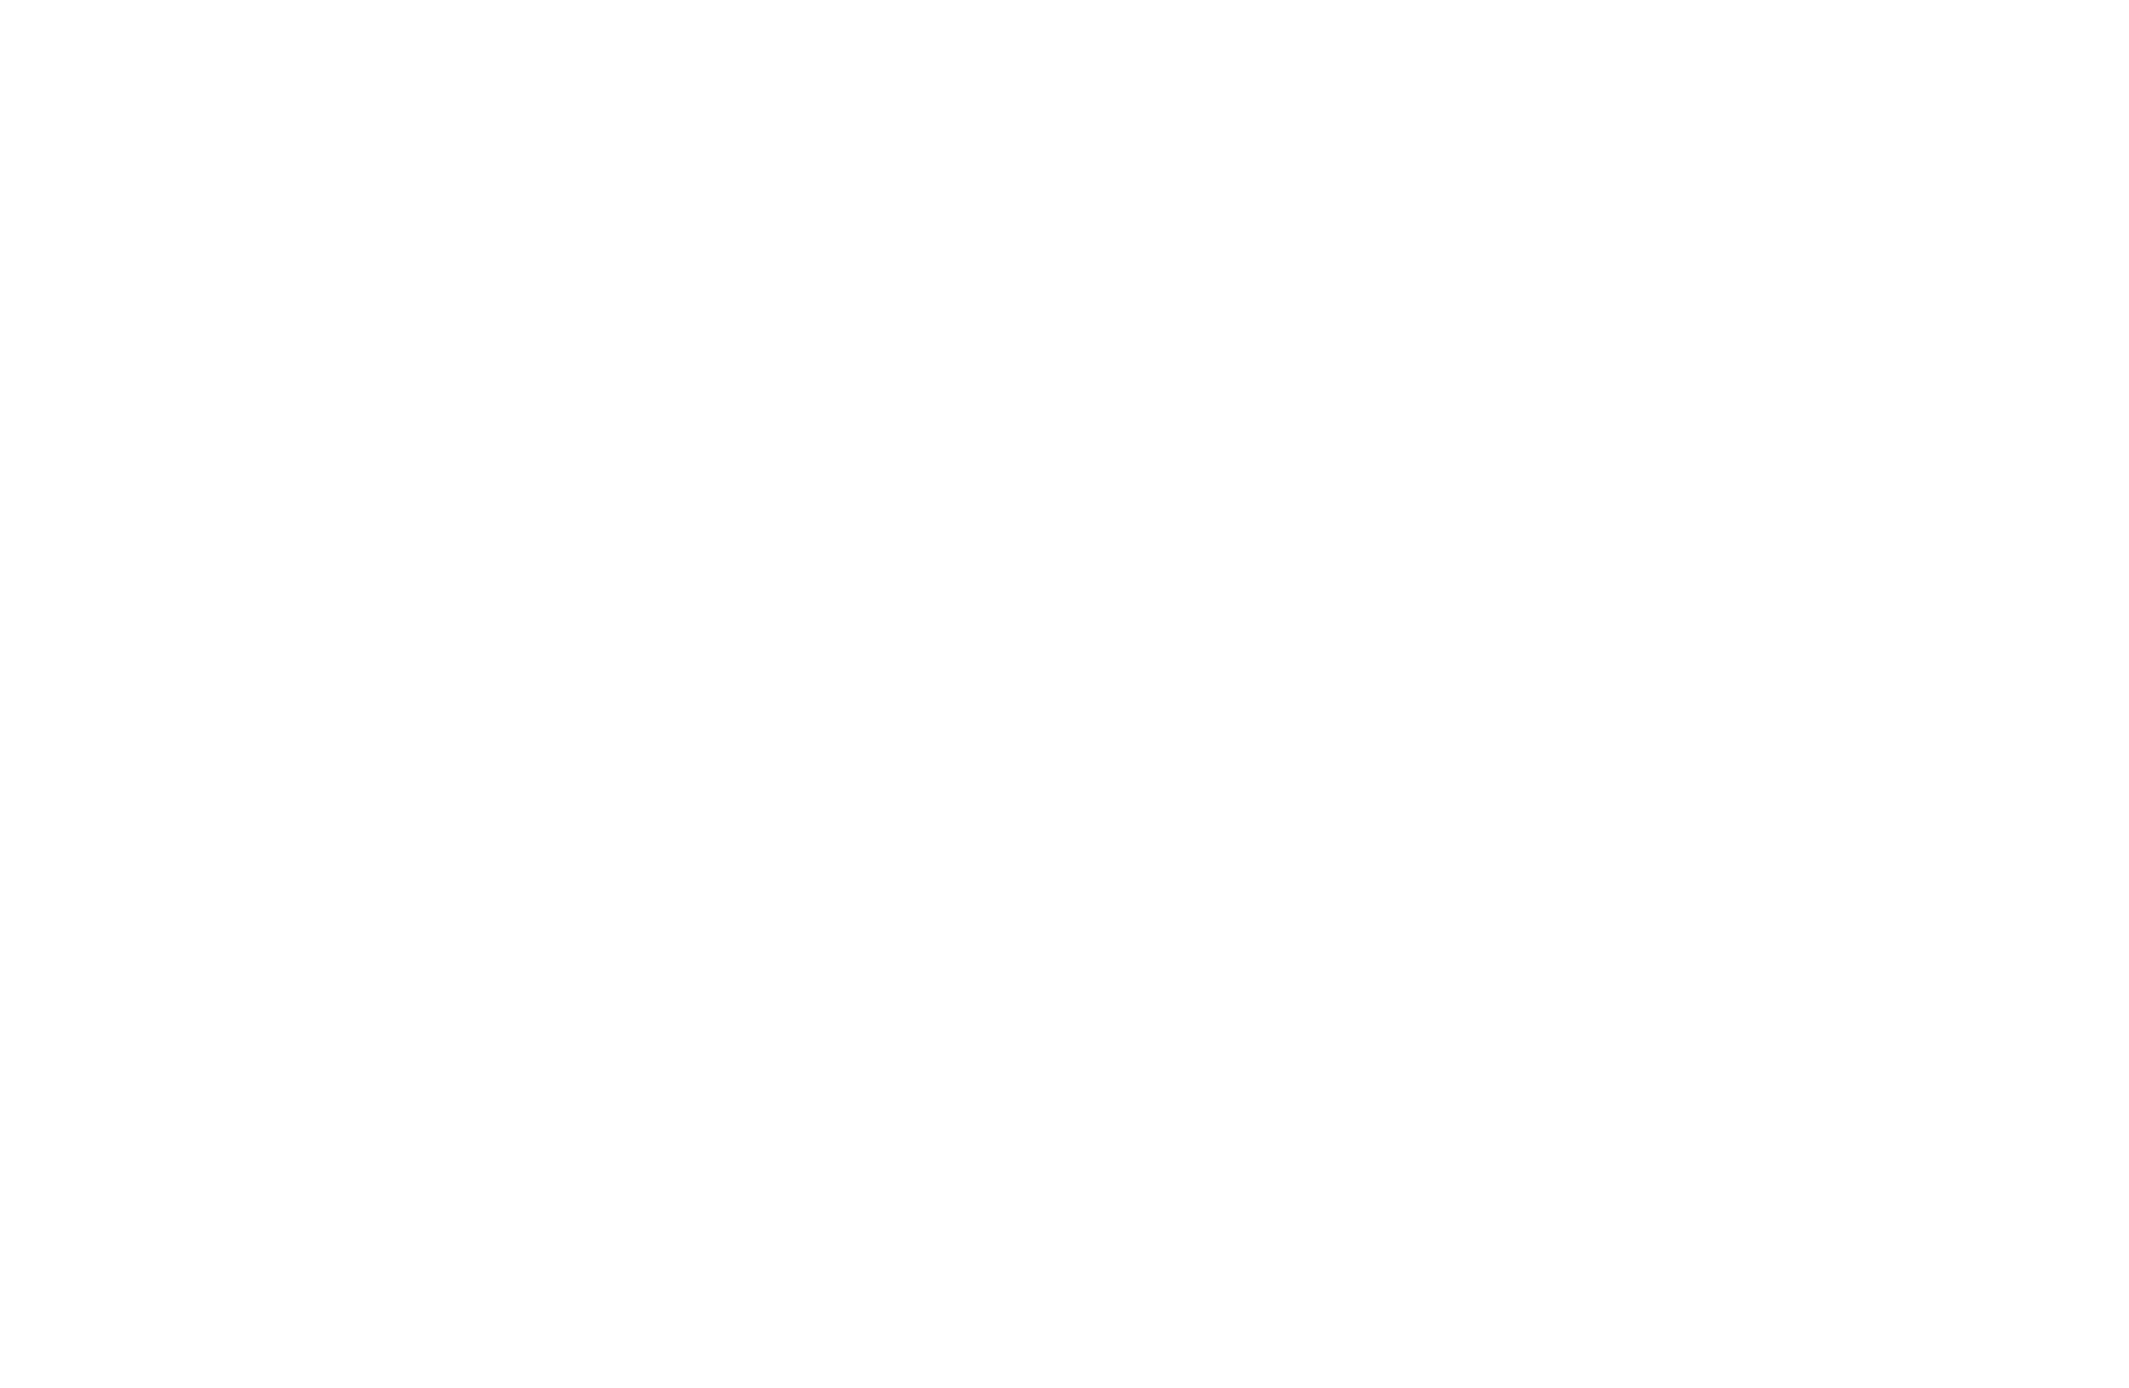 Wolfs Burger